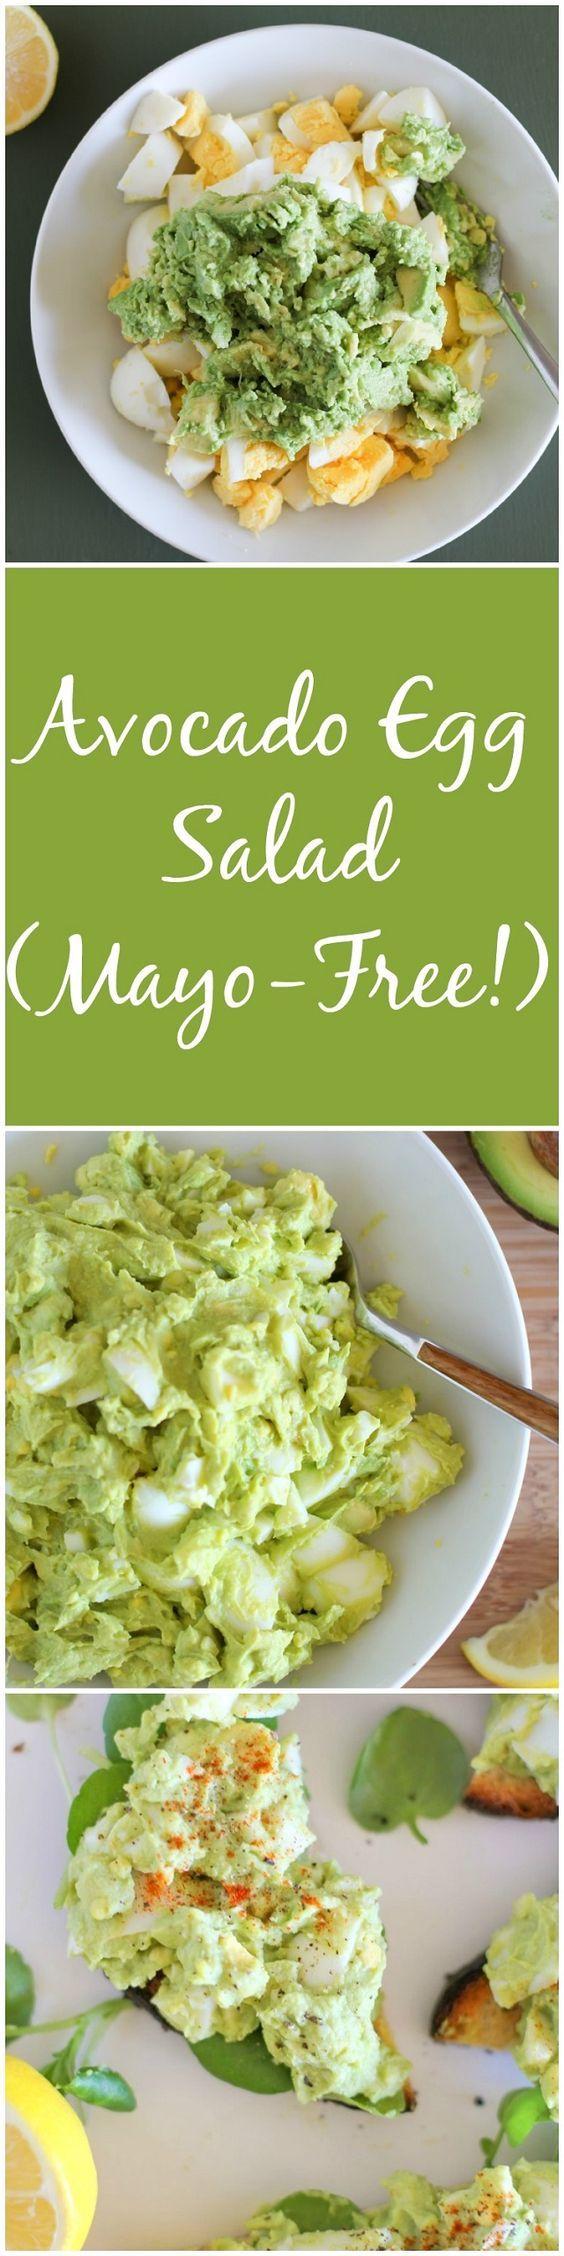 Avocado Egg Salad Recipe | Buzz Inspired